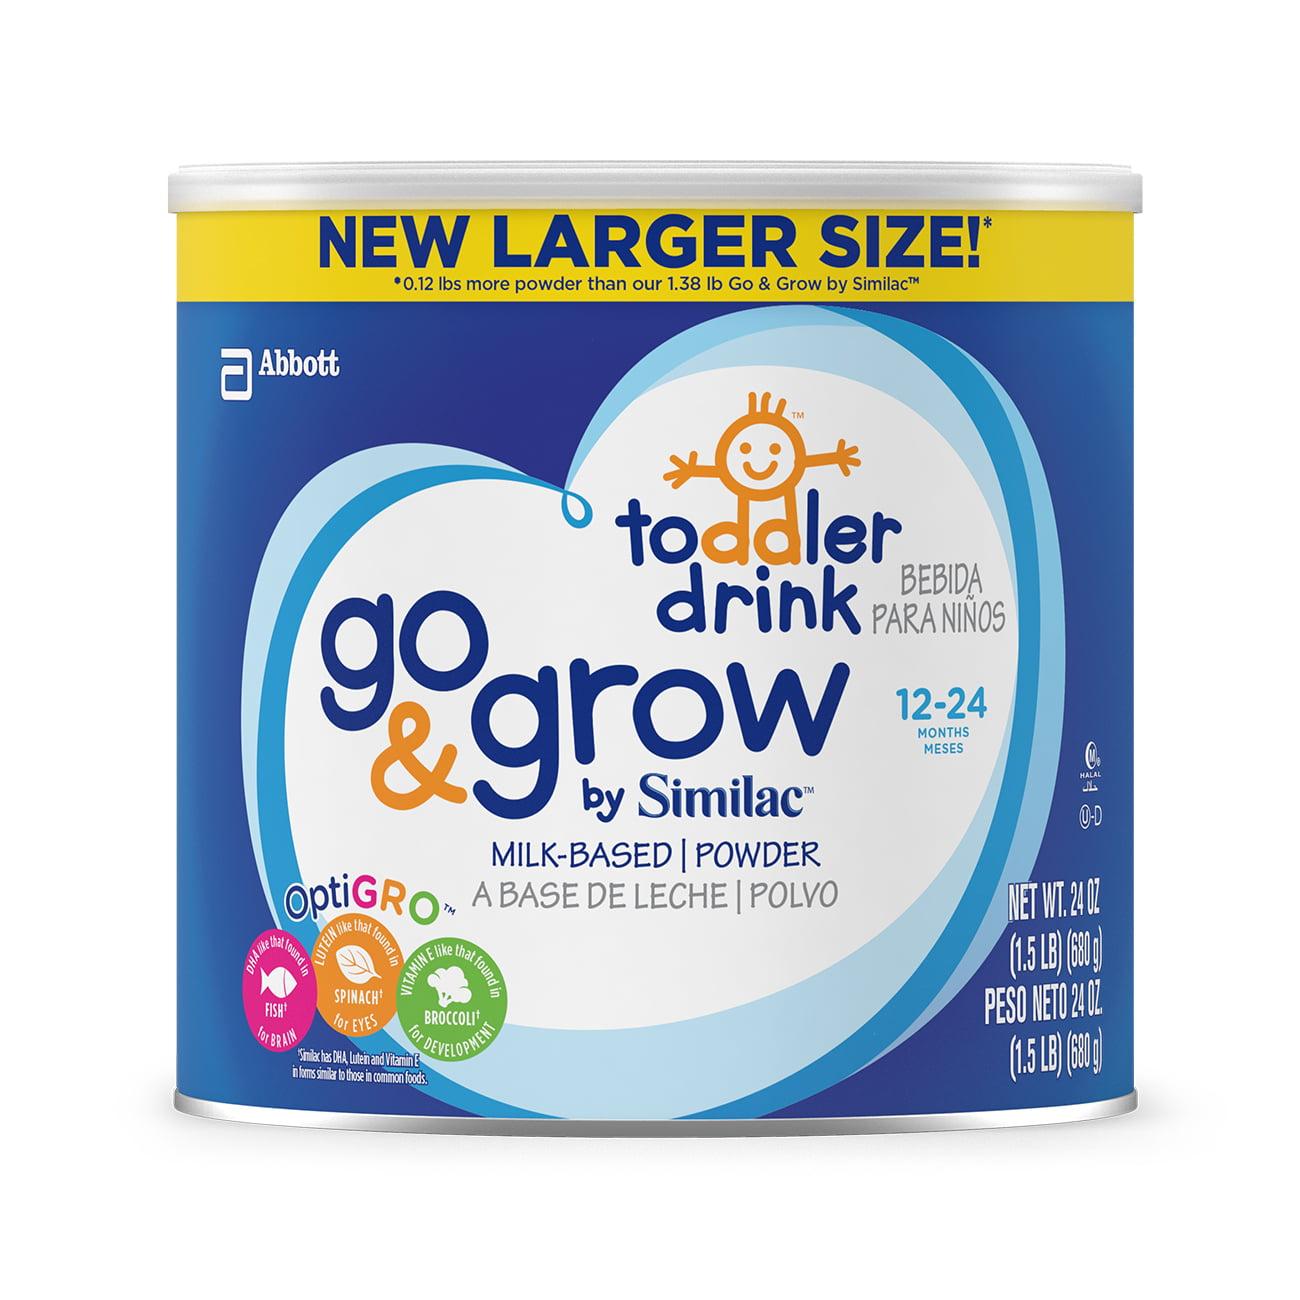 Go & Grow by Similac Milk-Based Toddler Drink, Powder, 1.5 lb